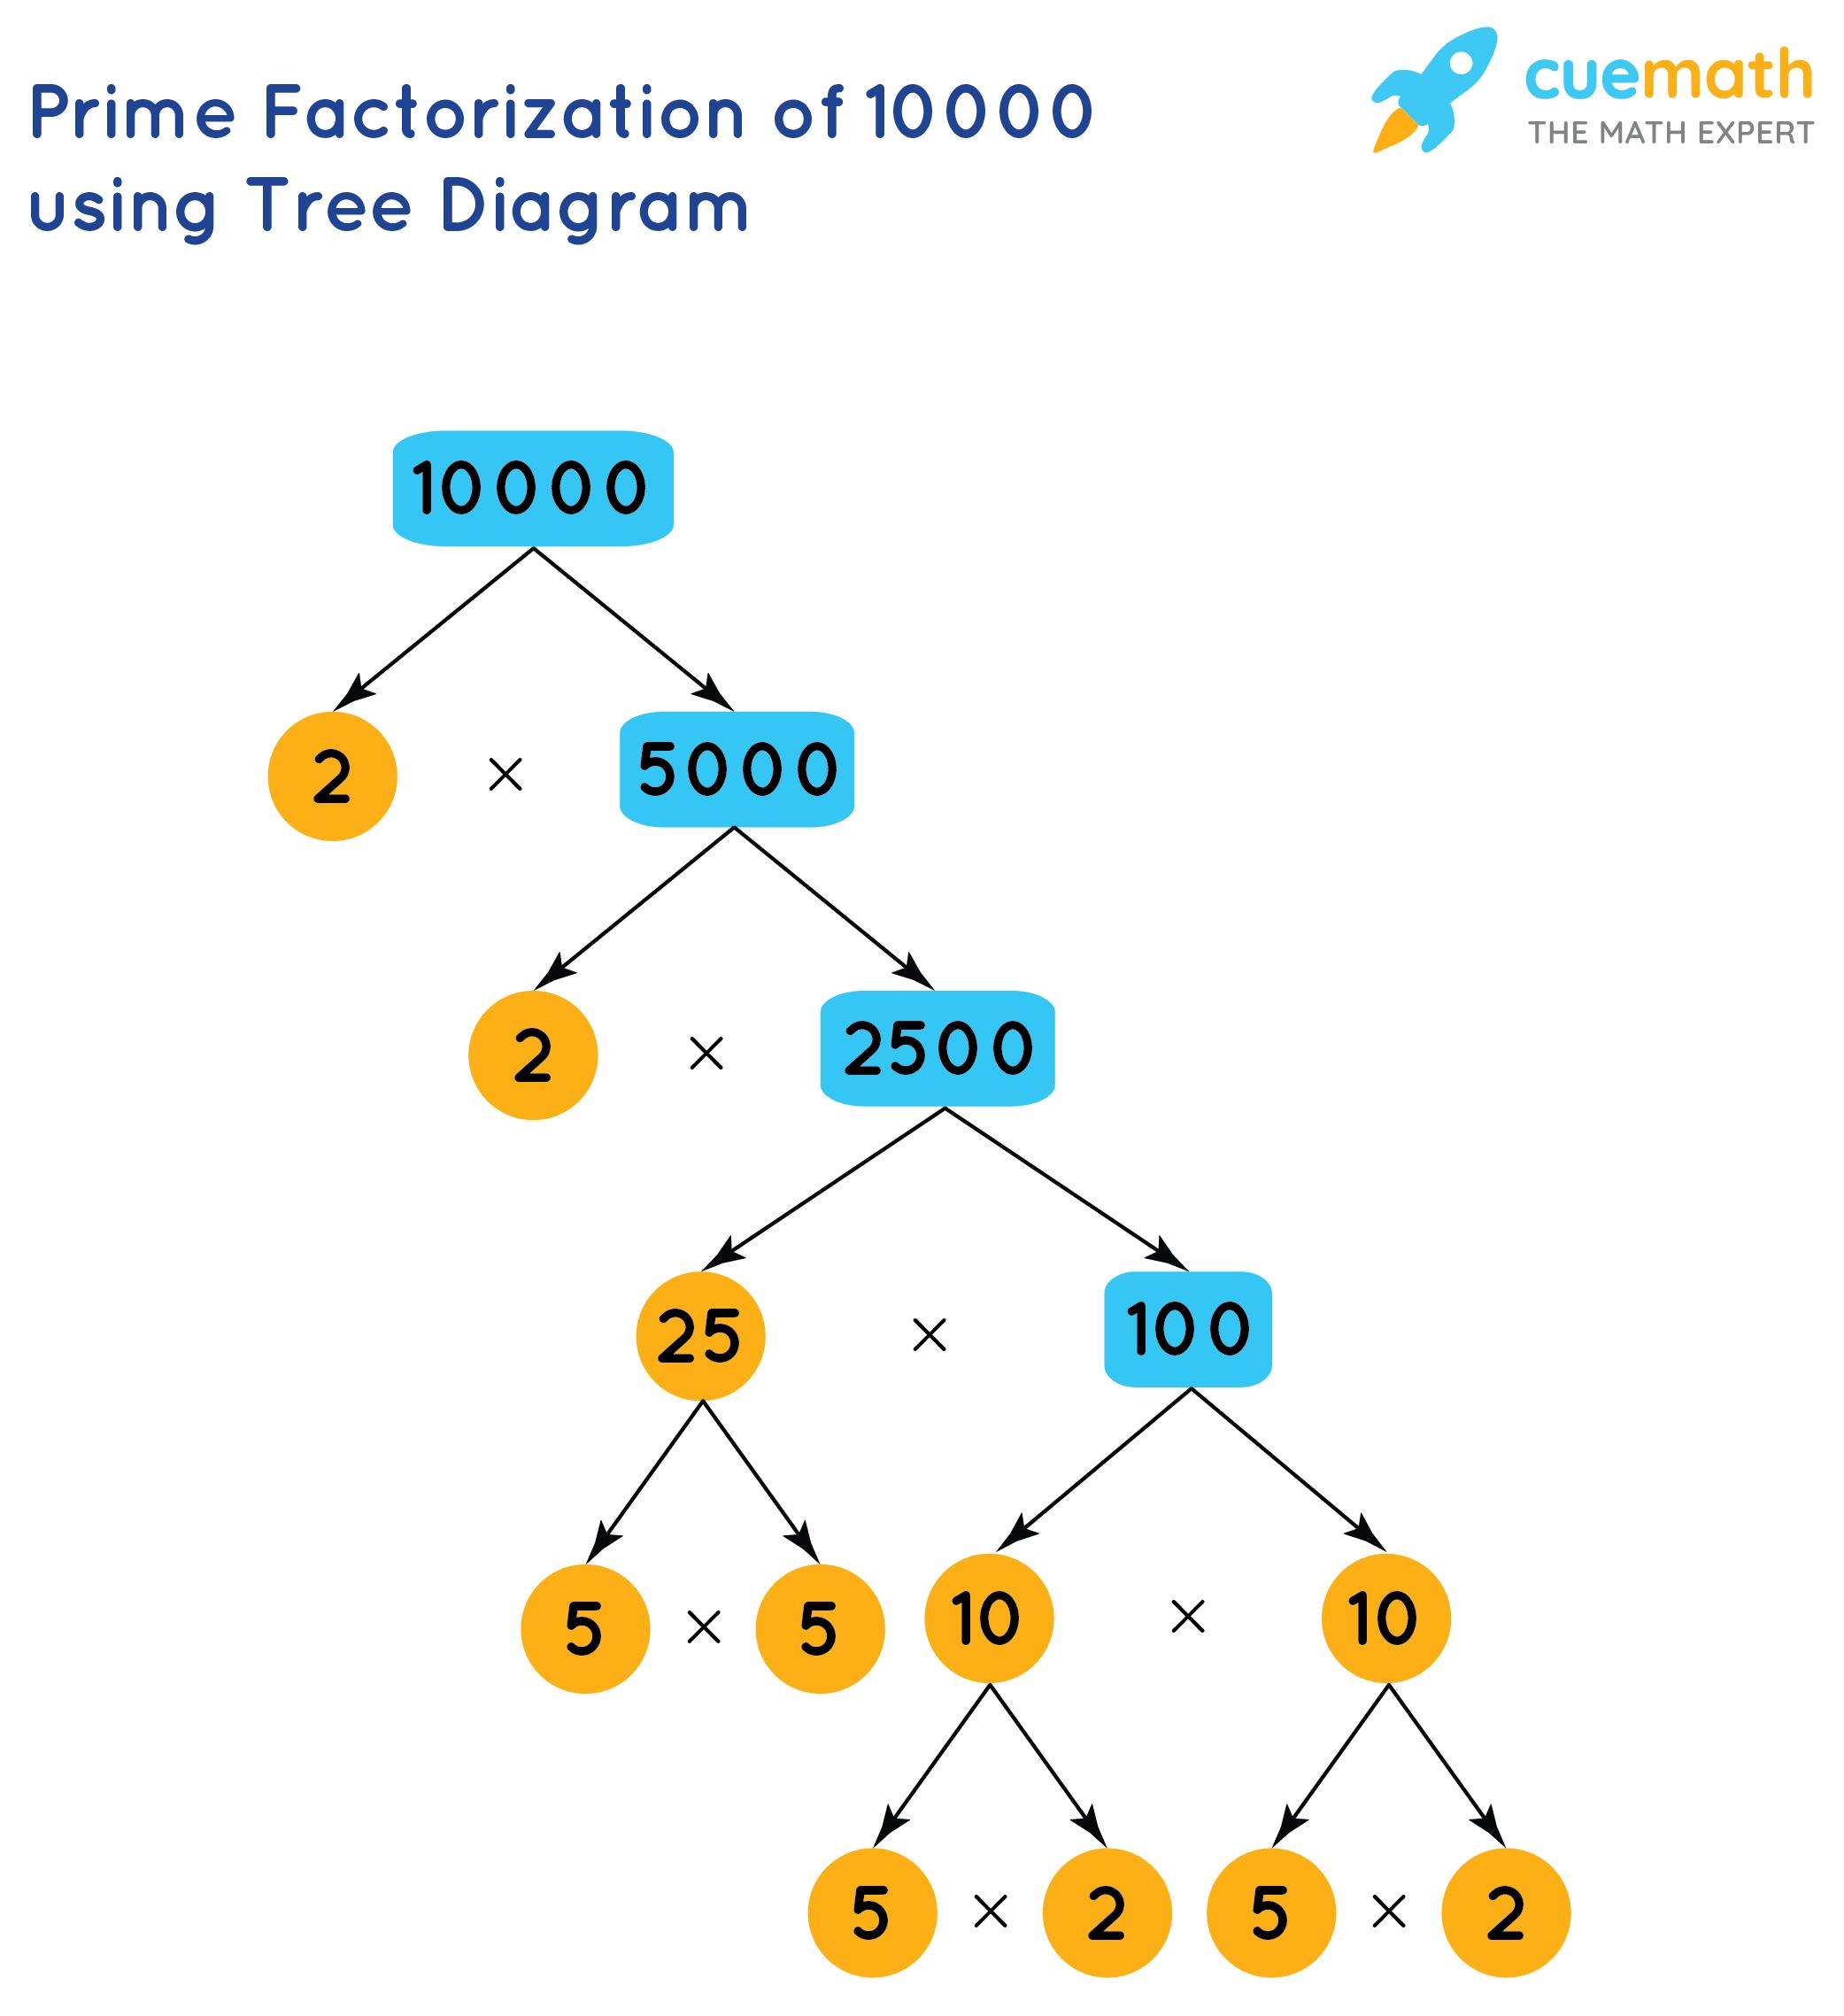 prime factorization of 10000